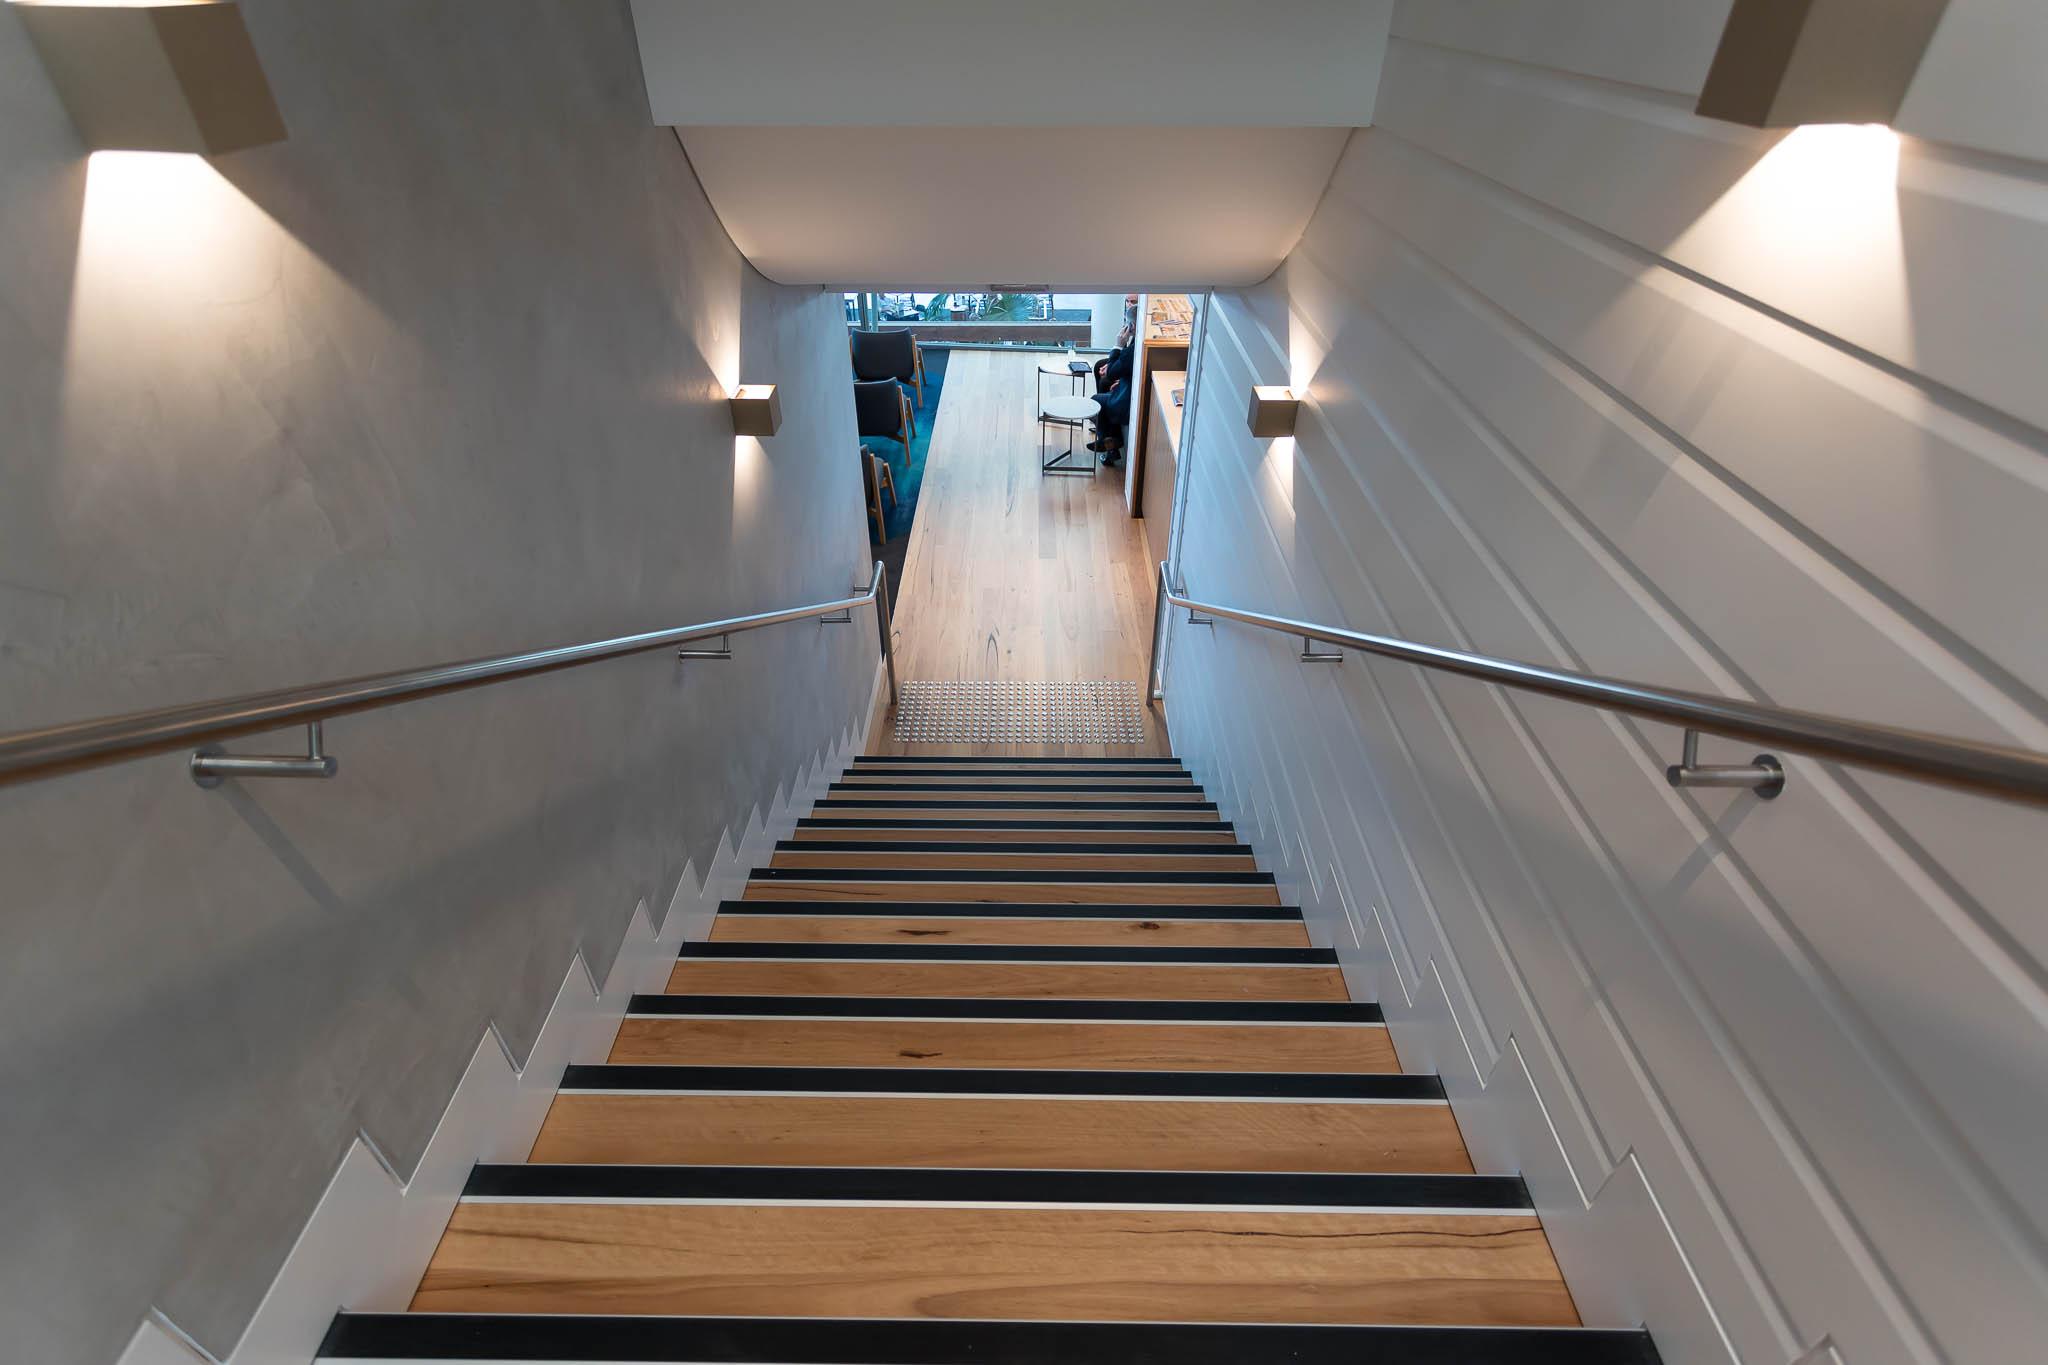 Qantas Brisbane International Lounge Stairs To Level 2